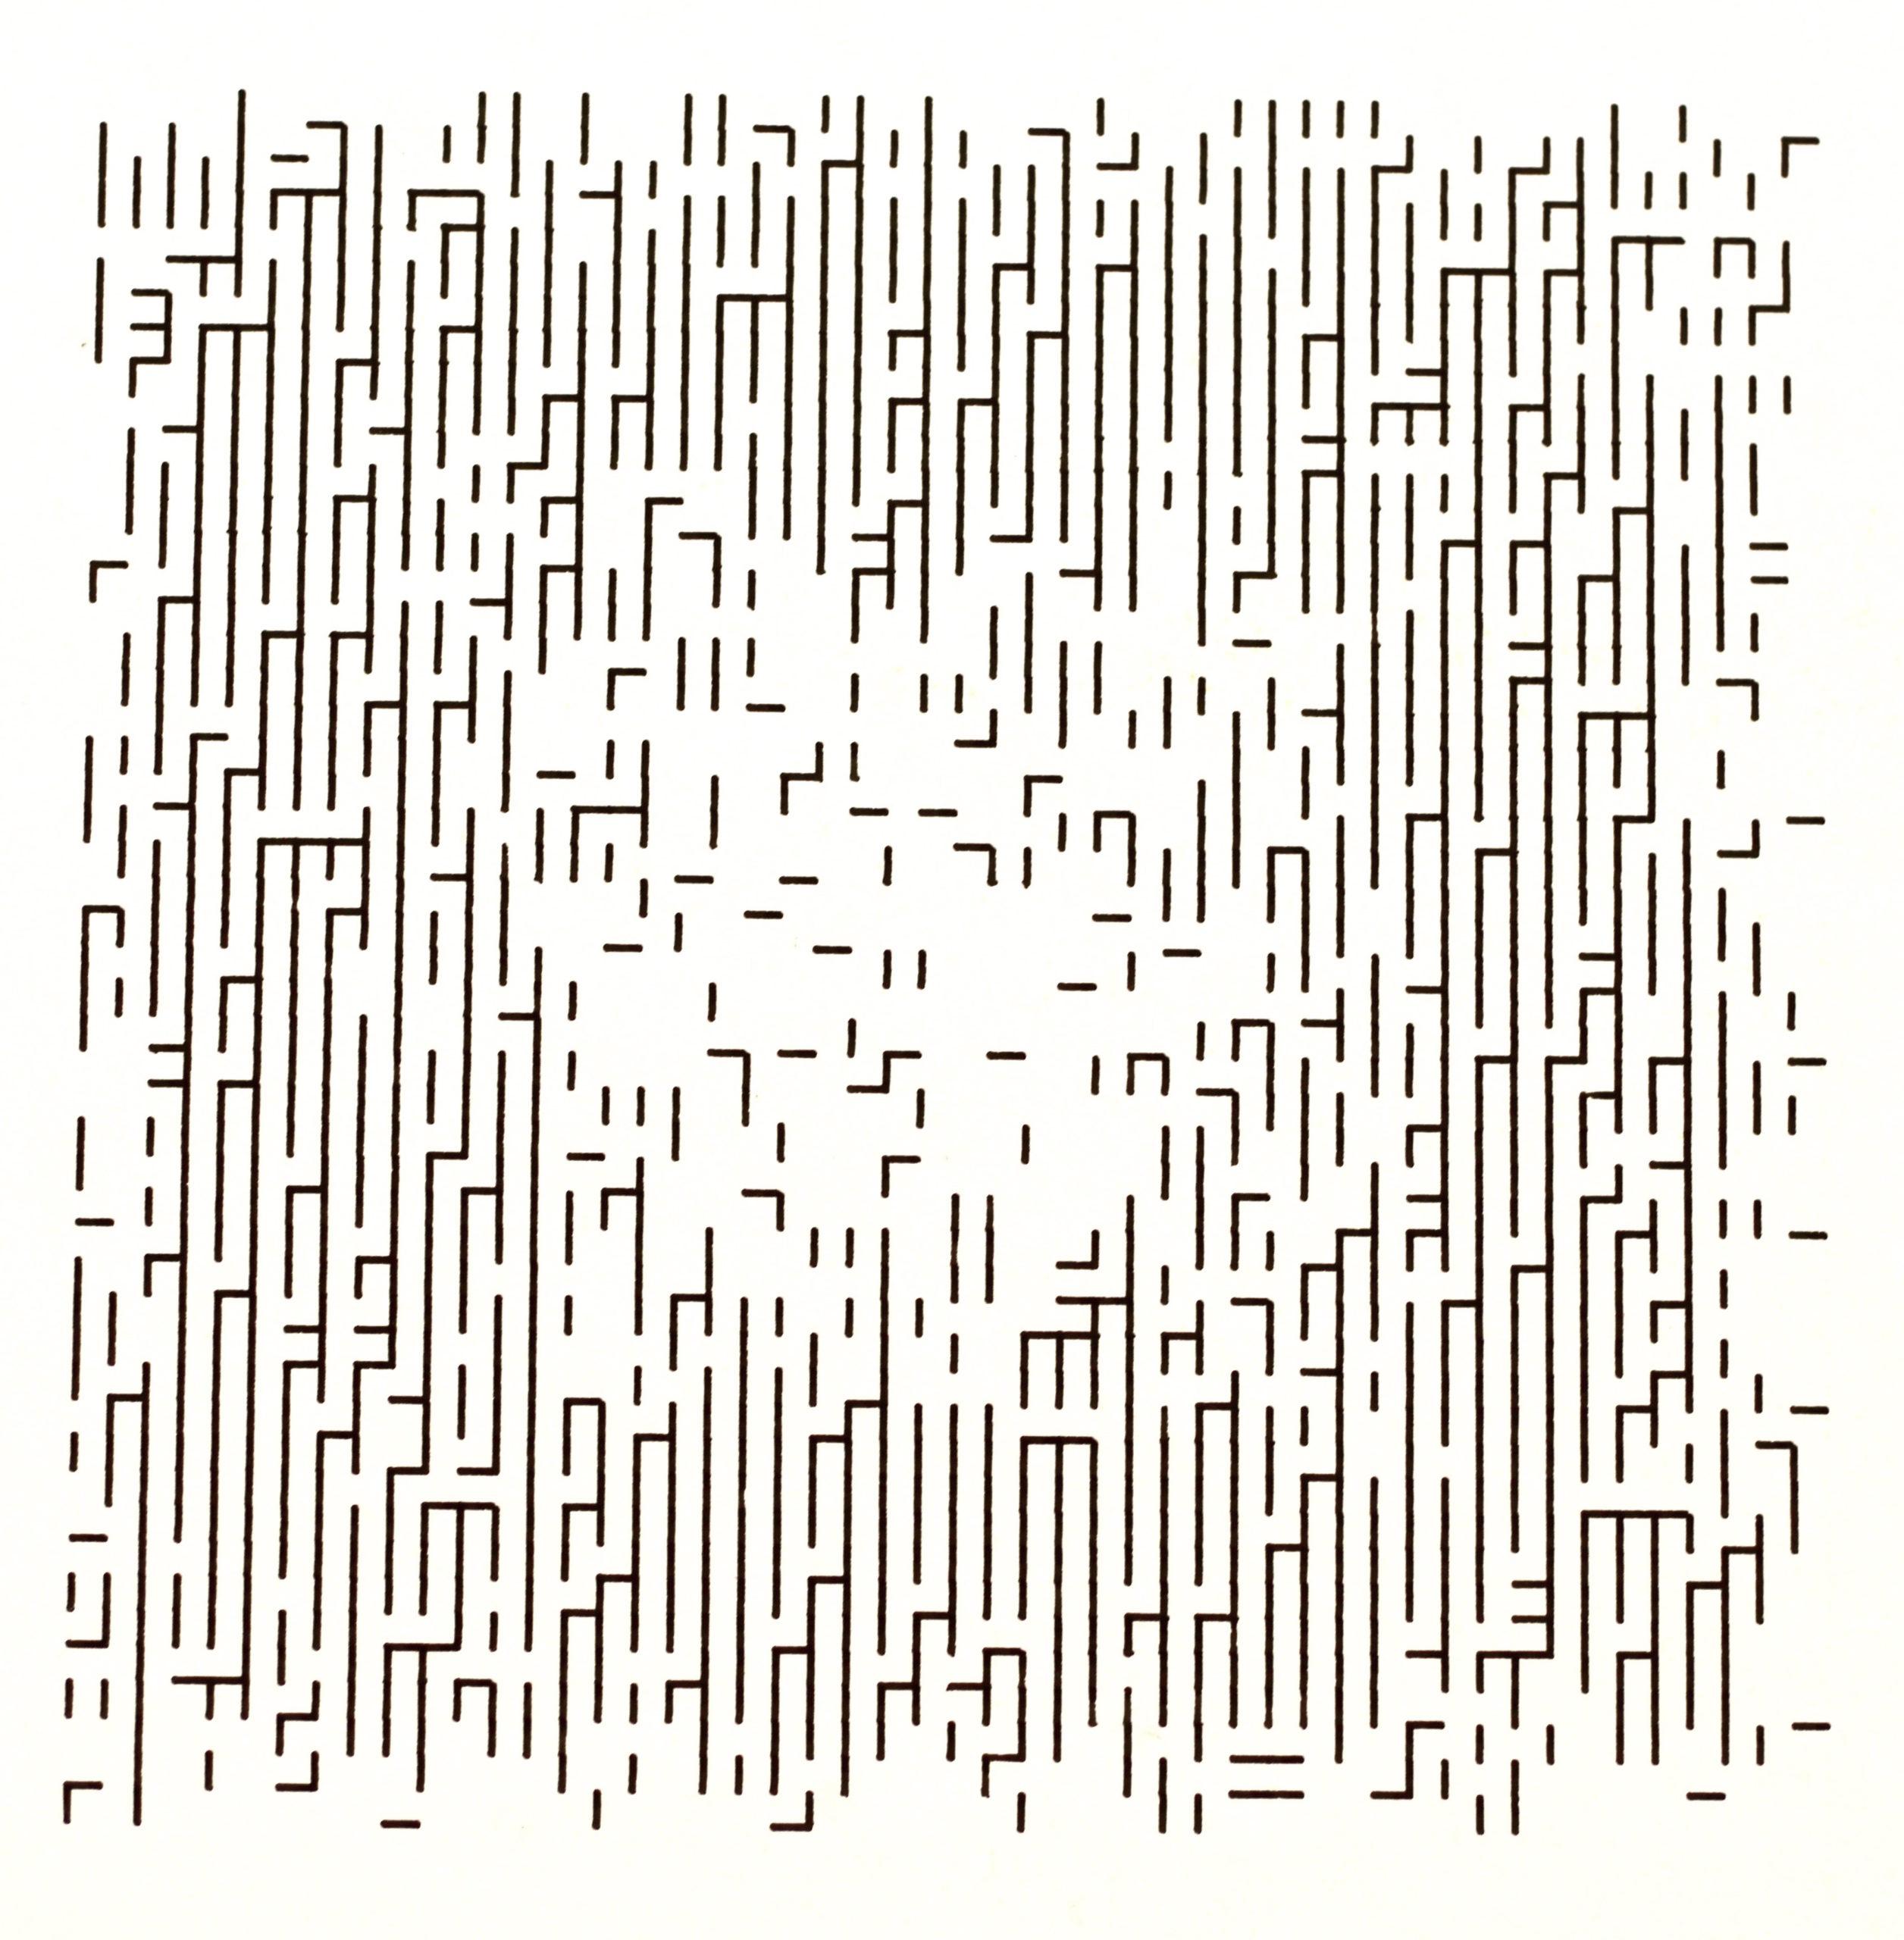 Frieder Nake, 4.11.66 Nr.1 Serie 2.1-6, plotter drawing, ink on paper, 26 x 26 cm, 1966